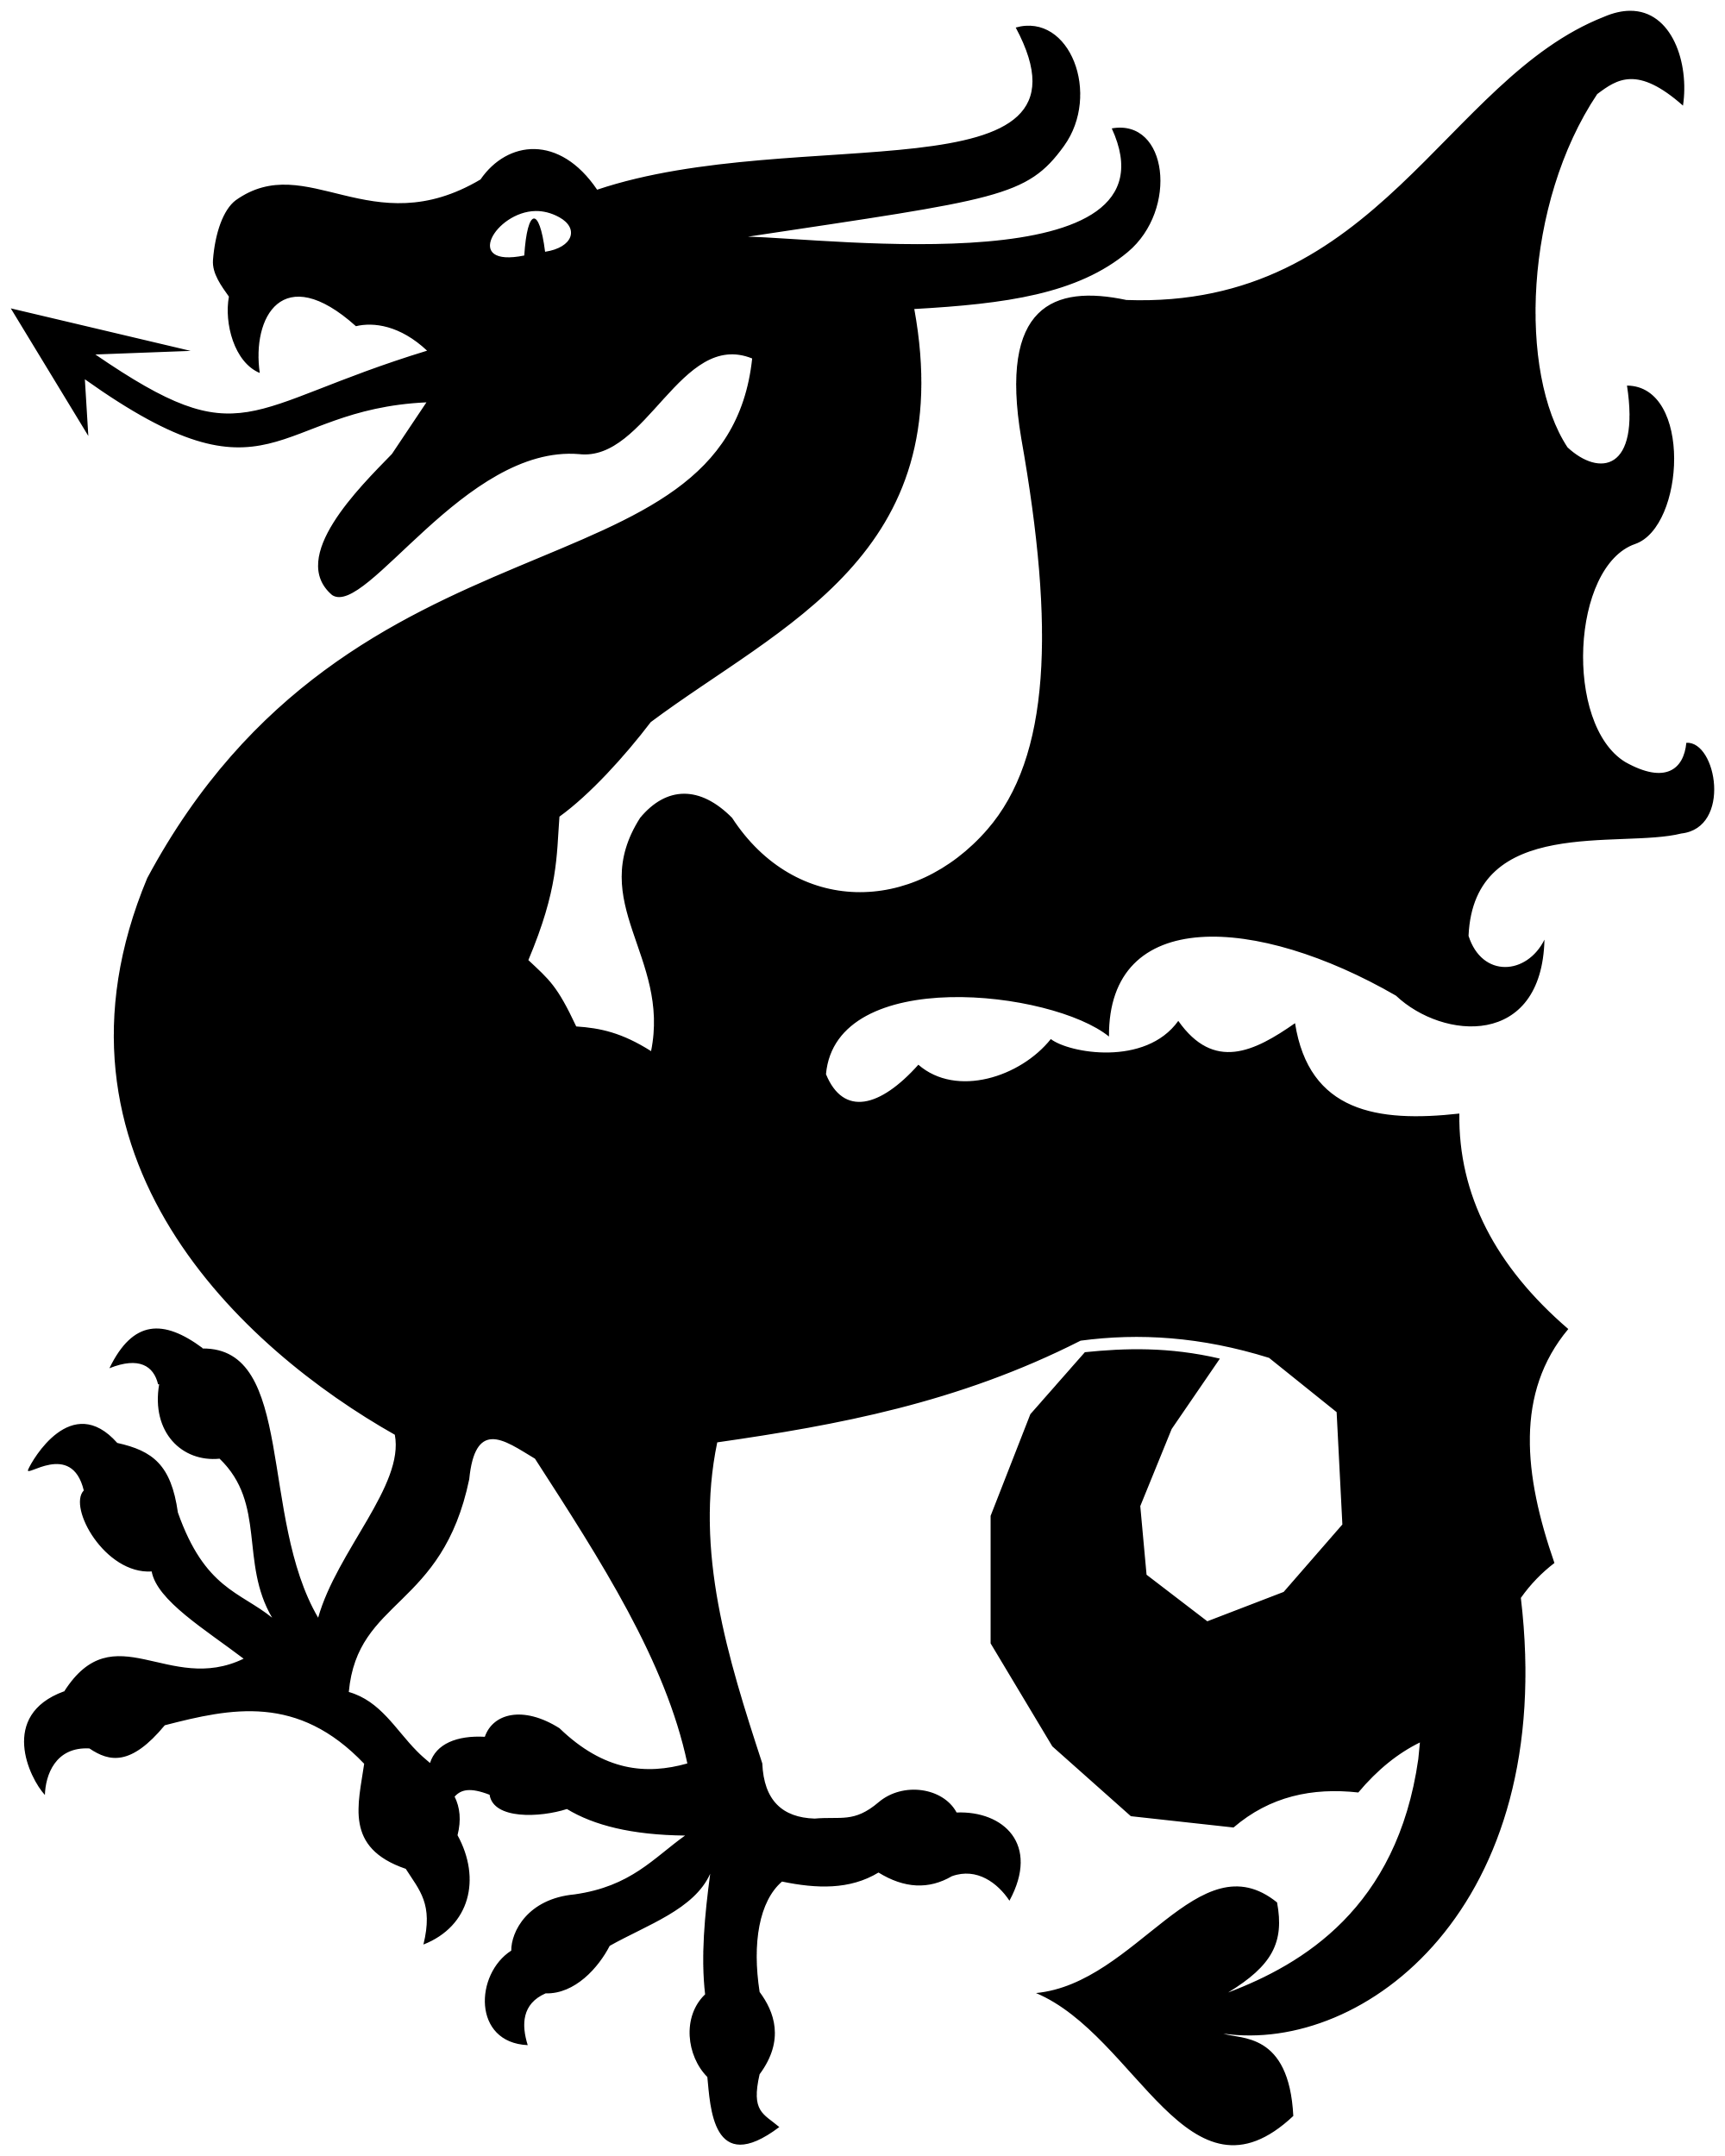 2000x2500 Filedragon Silhouette.svg